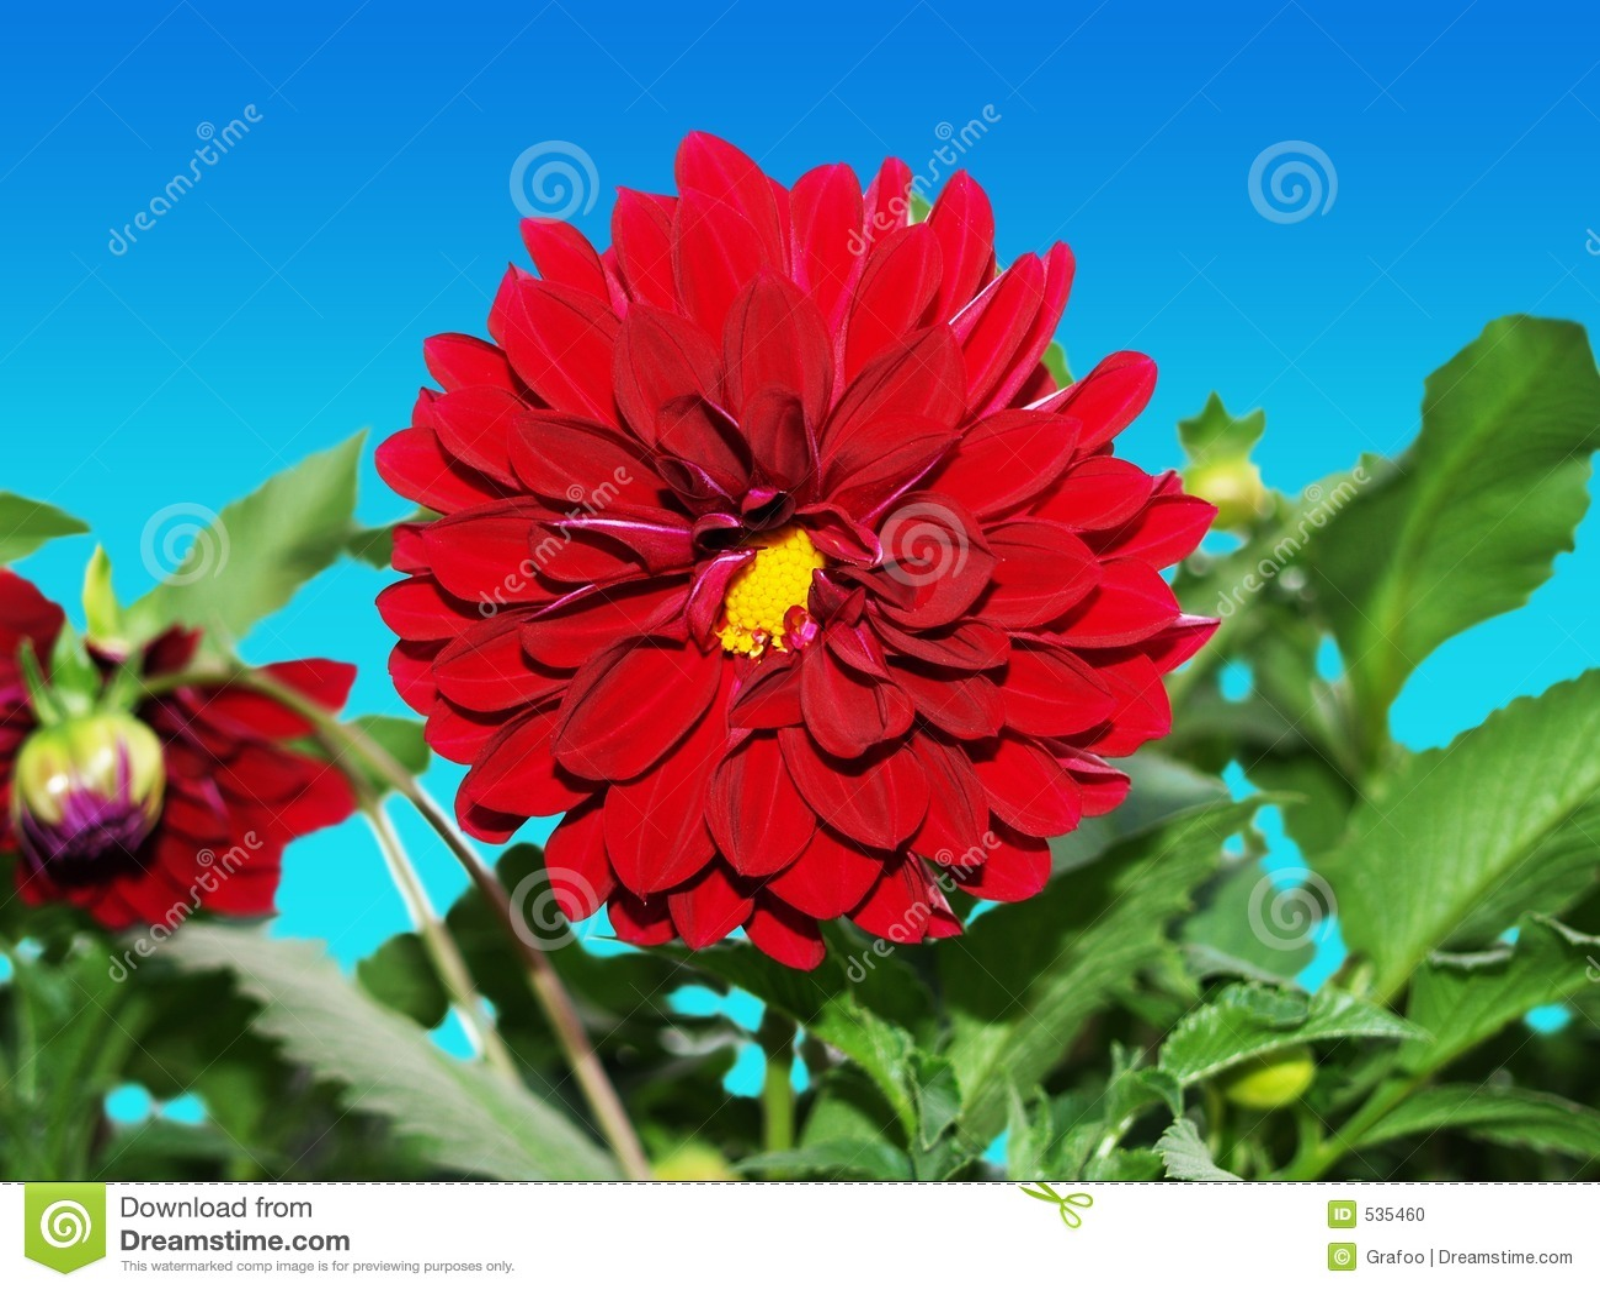 Download 美好的clippath花红色 库存照片. 图片 包括有 卖花人, 业余爱好, 编排者, 礼品, 增长, 创建 - 535460